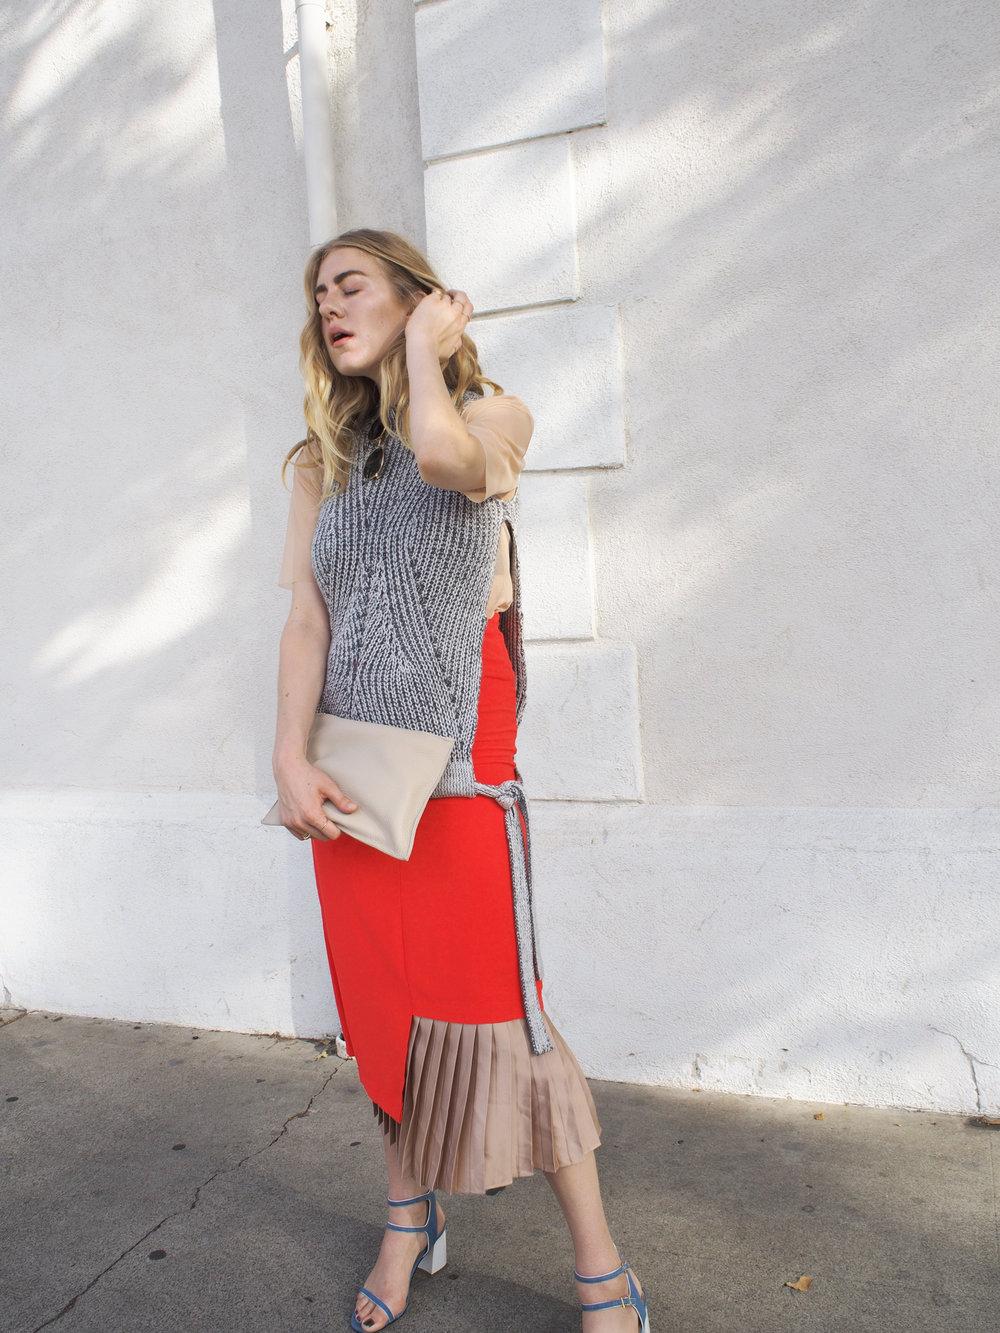 Taylr Anne OOTD Layering Jaggar Footwear Heewan Red Skirt Stylestalker Sweater Zara Sheer Shirt www.taylranne.com